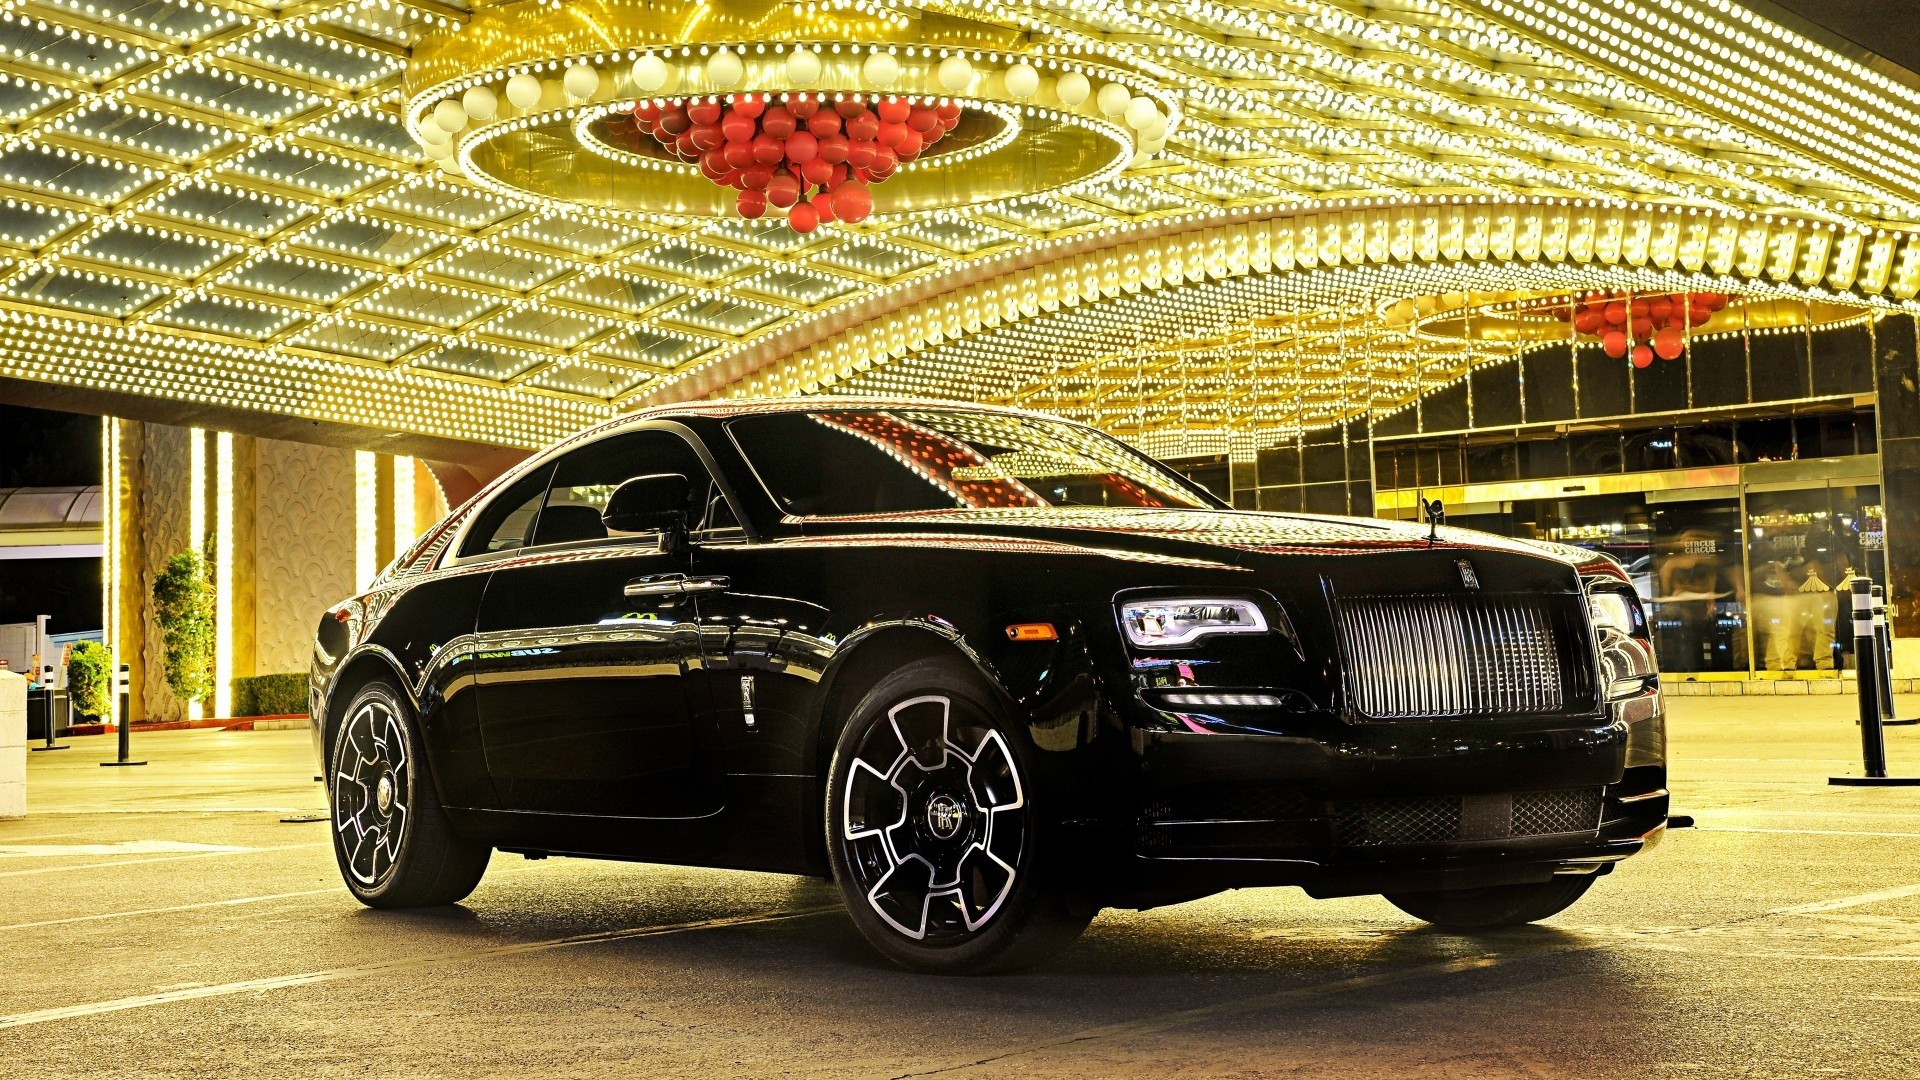 Rolls Royce Wraith Full HD Wallpaper